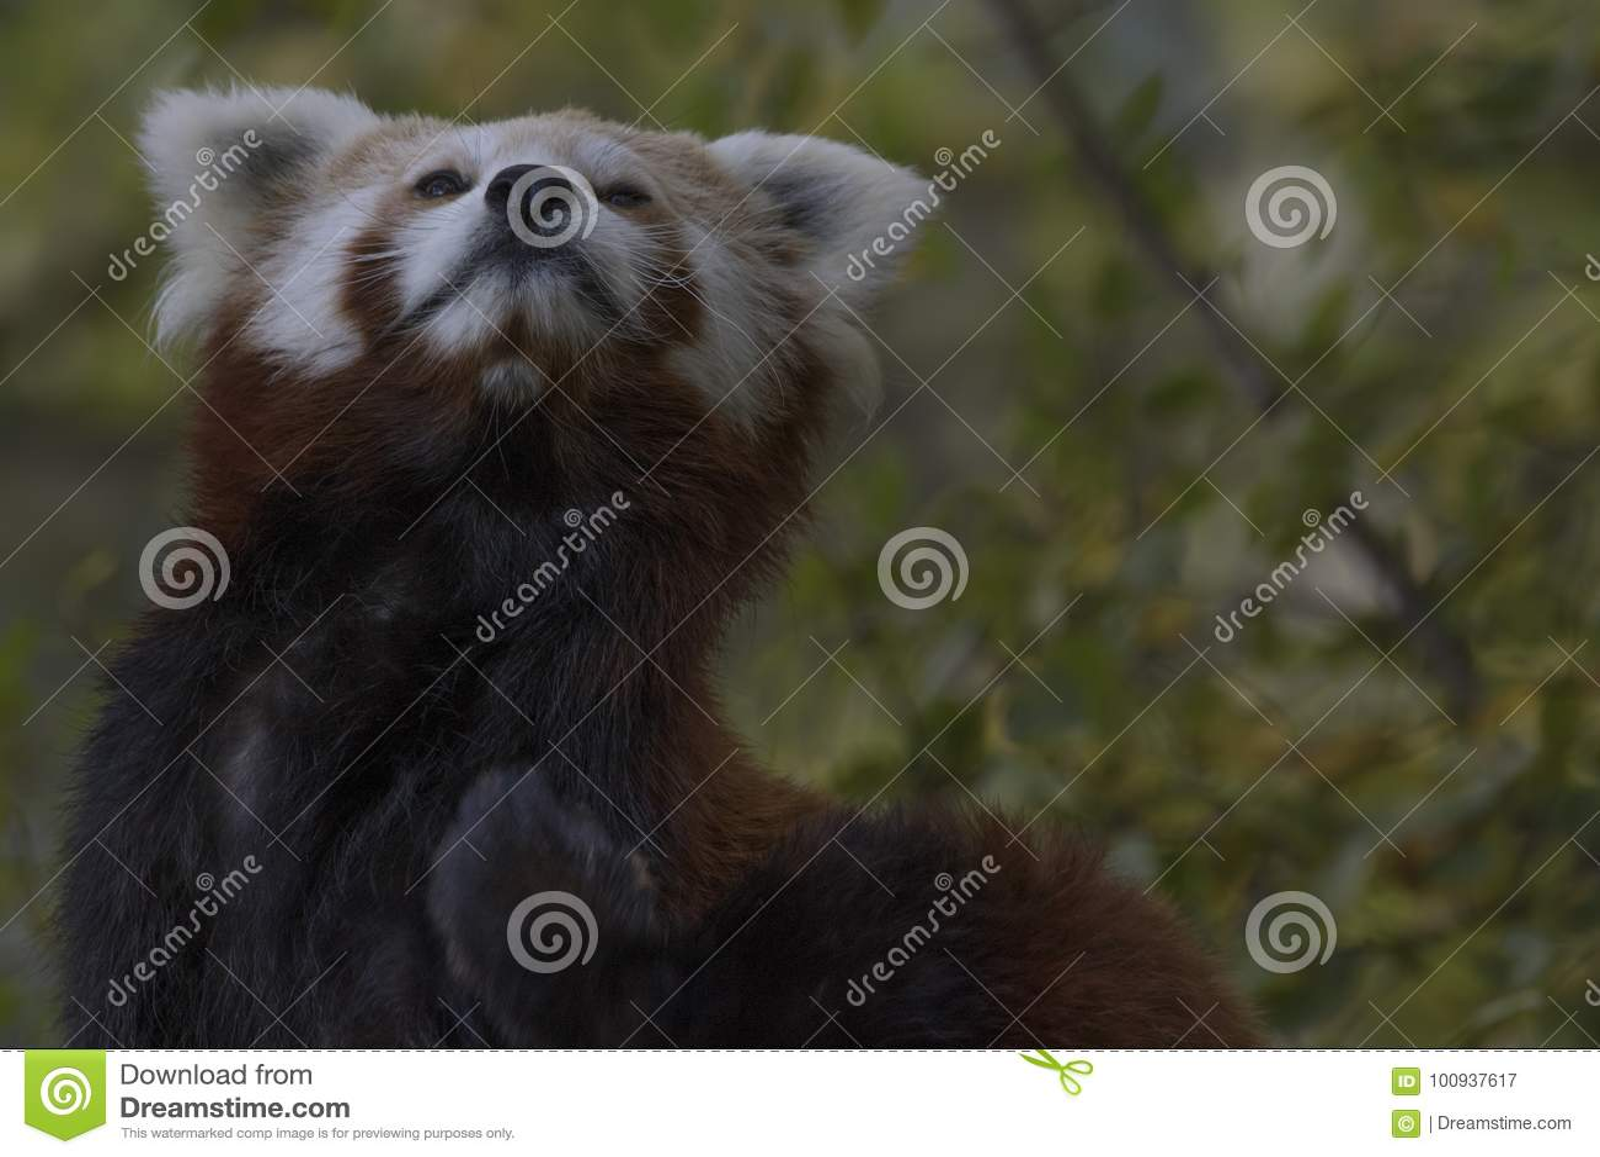 Red Panda Behaviour, Scratching, Yawning, Portrait Stock Image